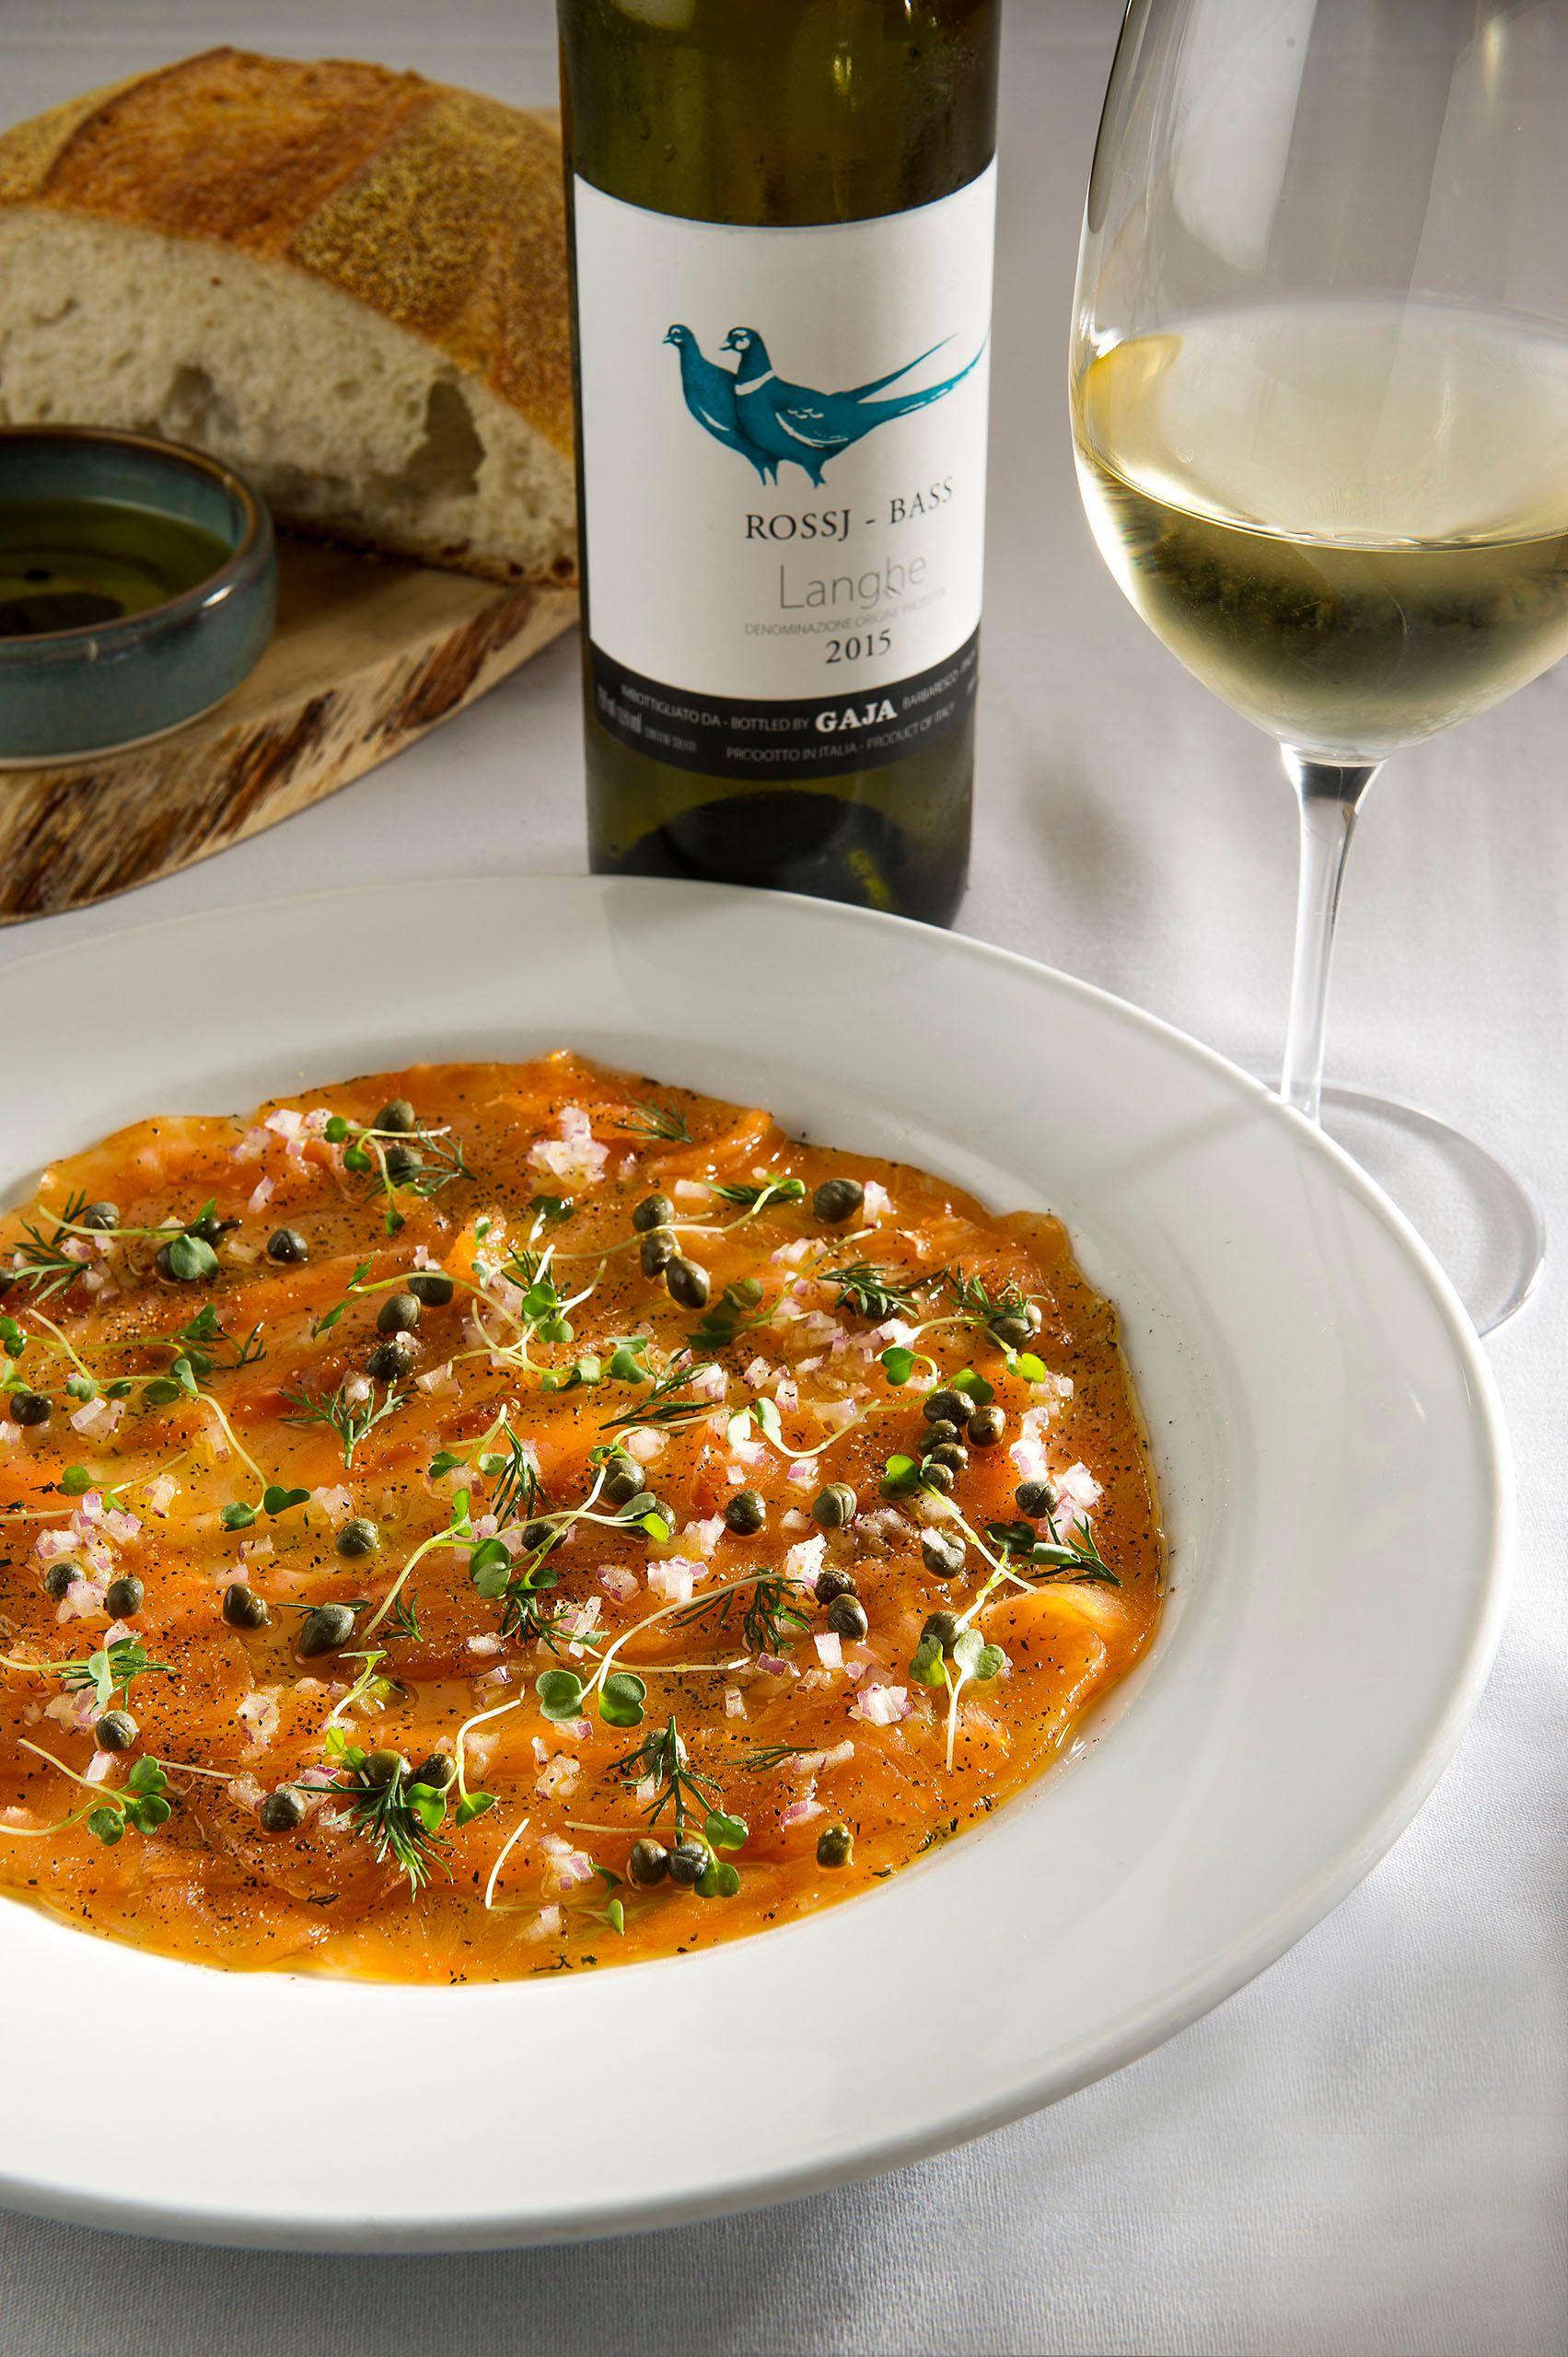 Cantoro's Italian Food